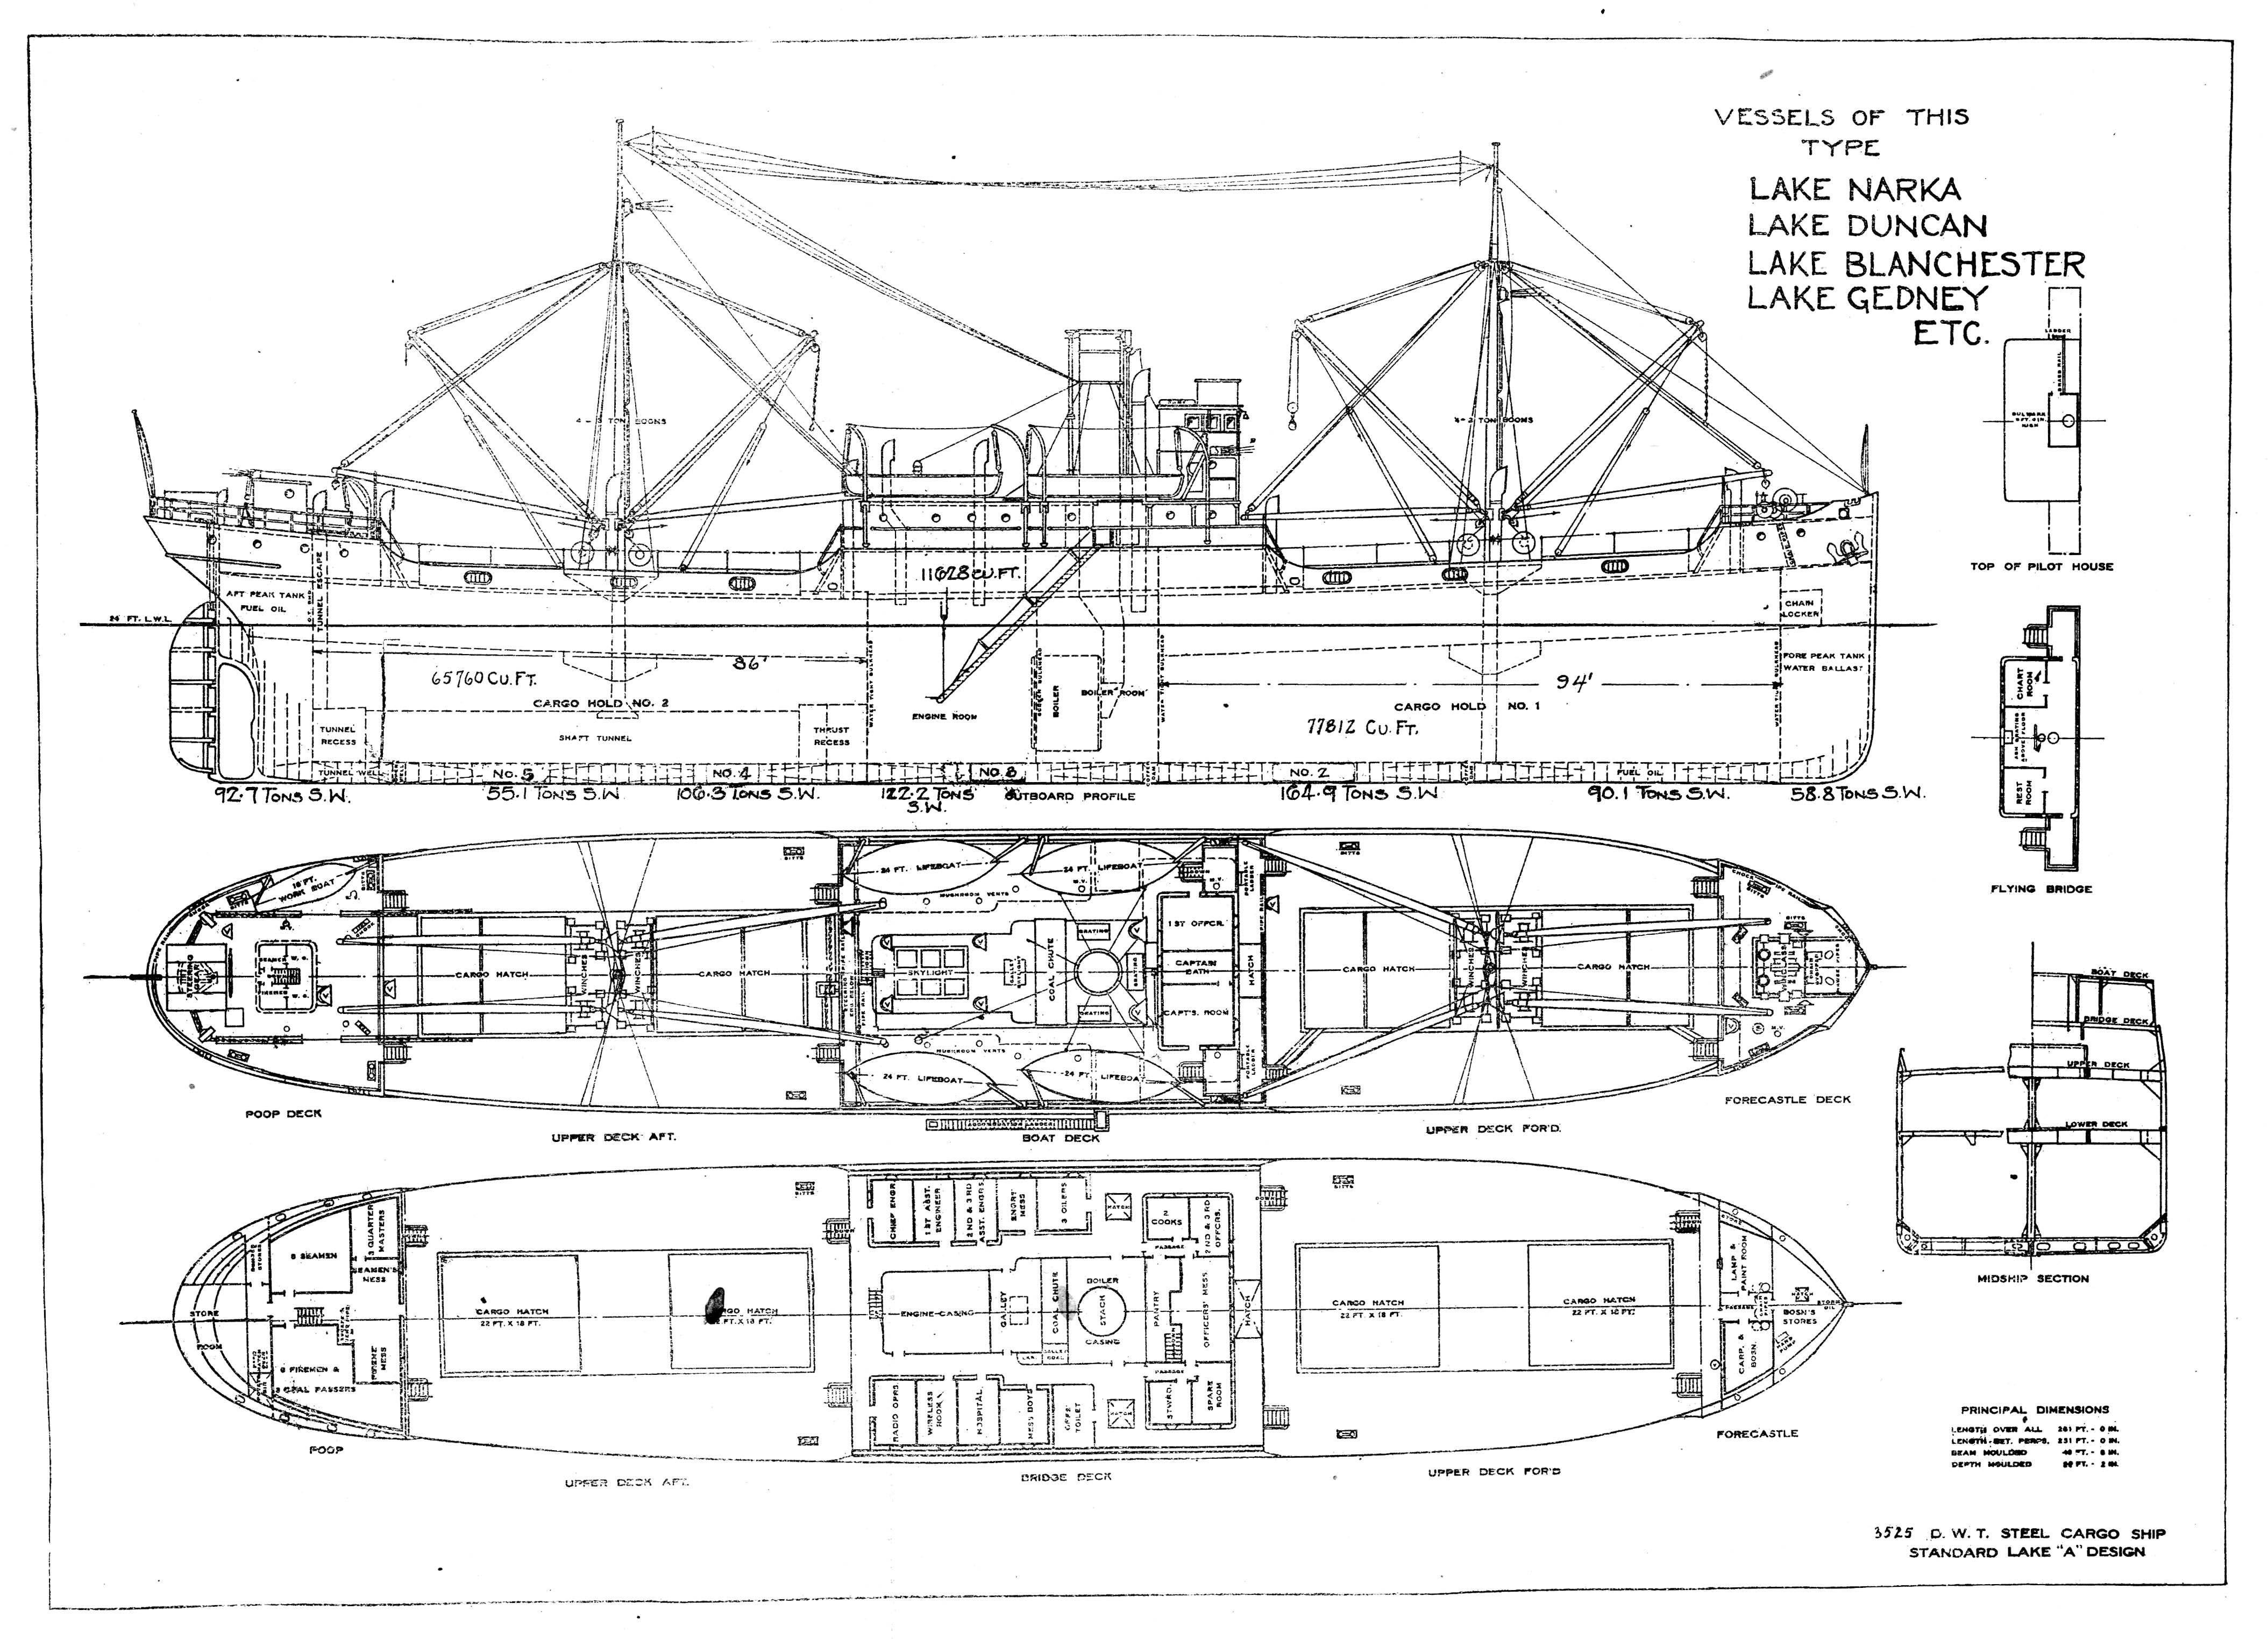 Vessel Plan